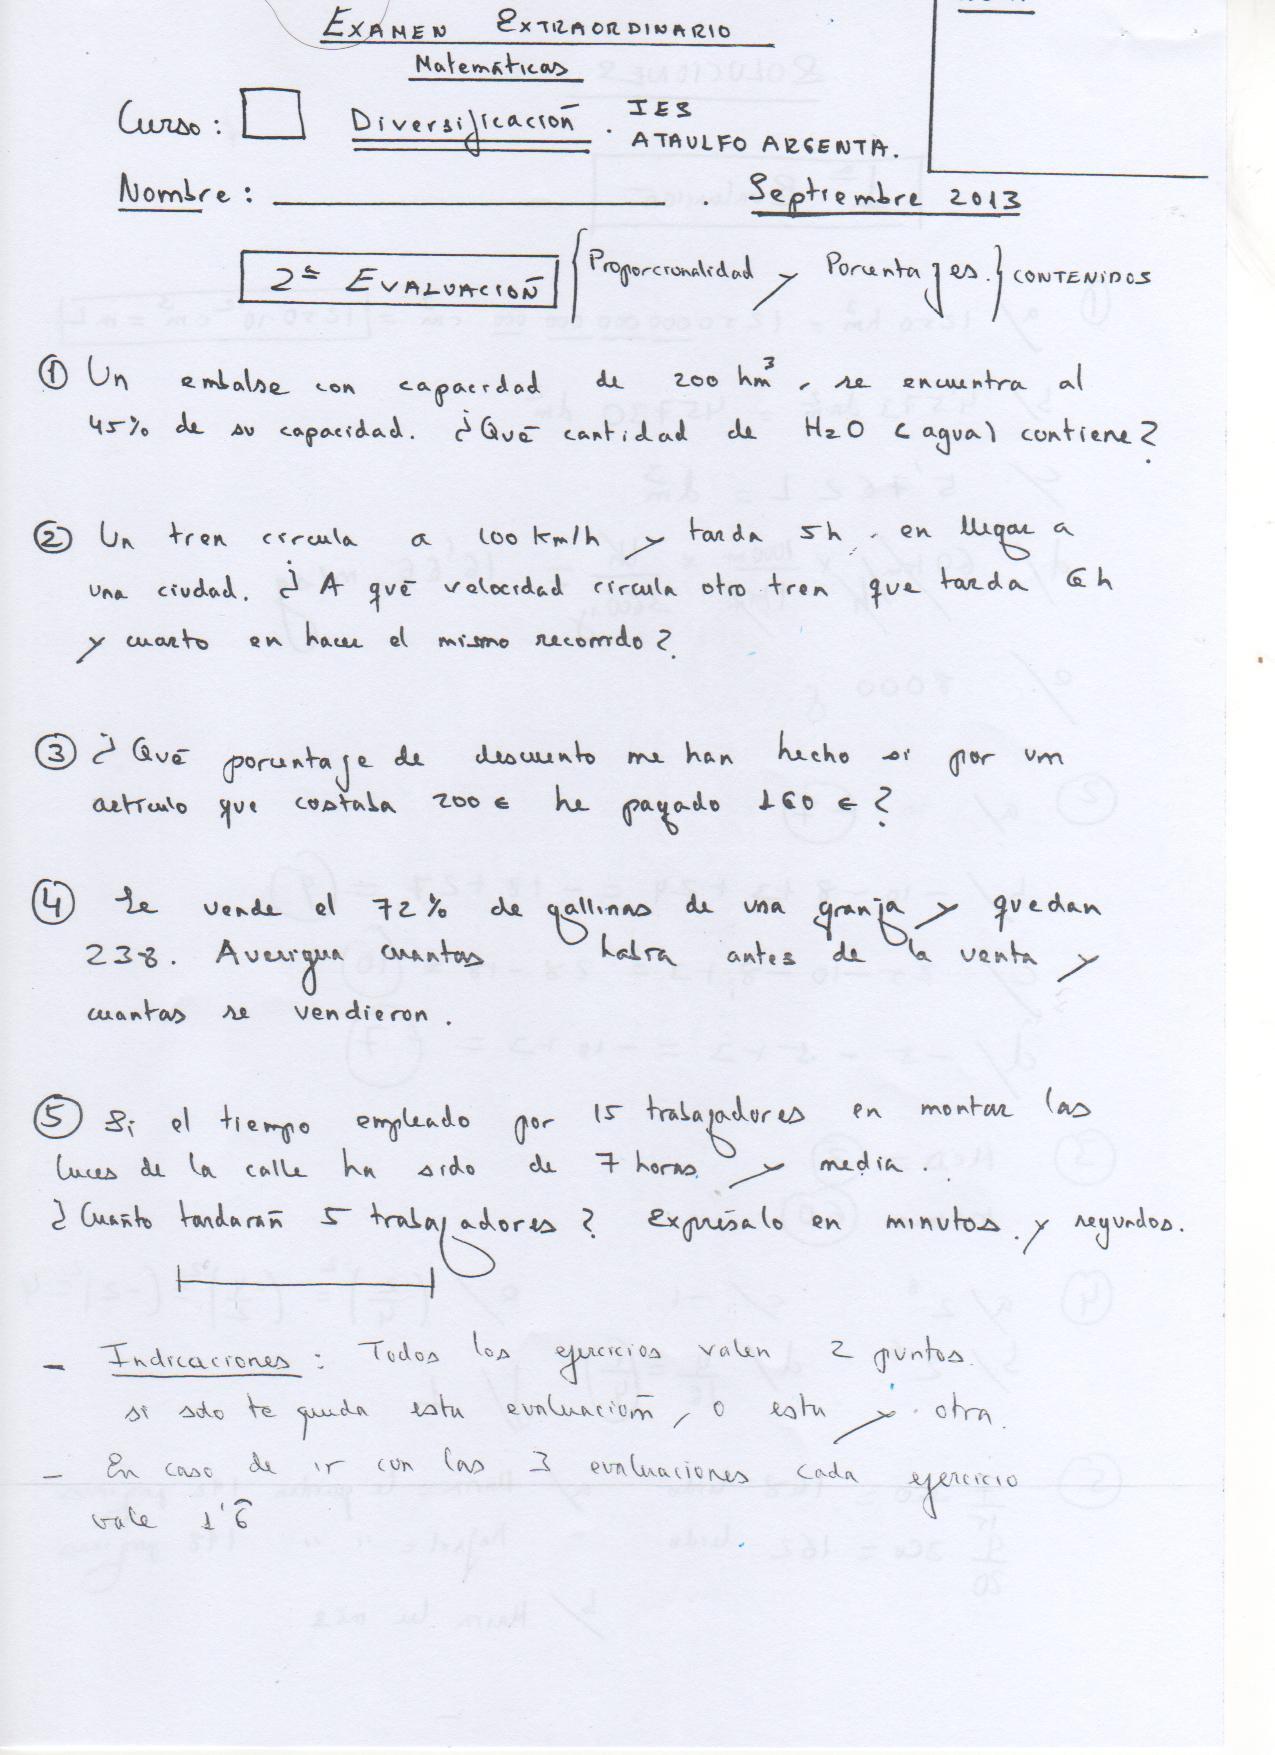 Modelos Exam Septiembre 2013 Pagina Jimdo De Biogeo Erp